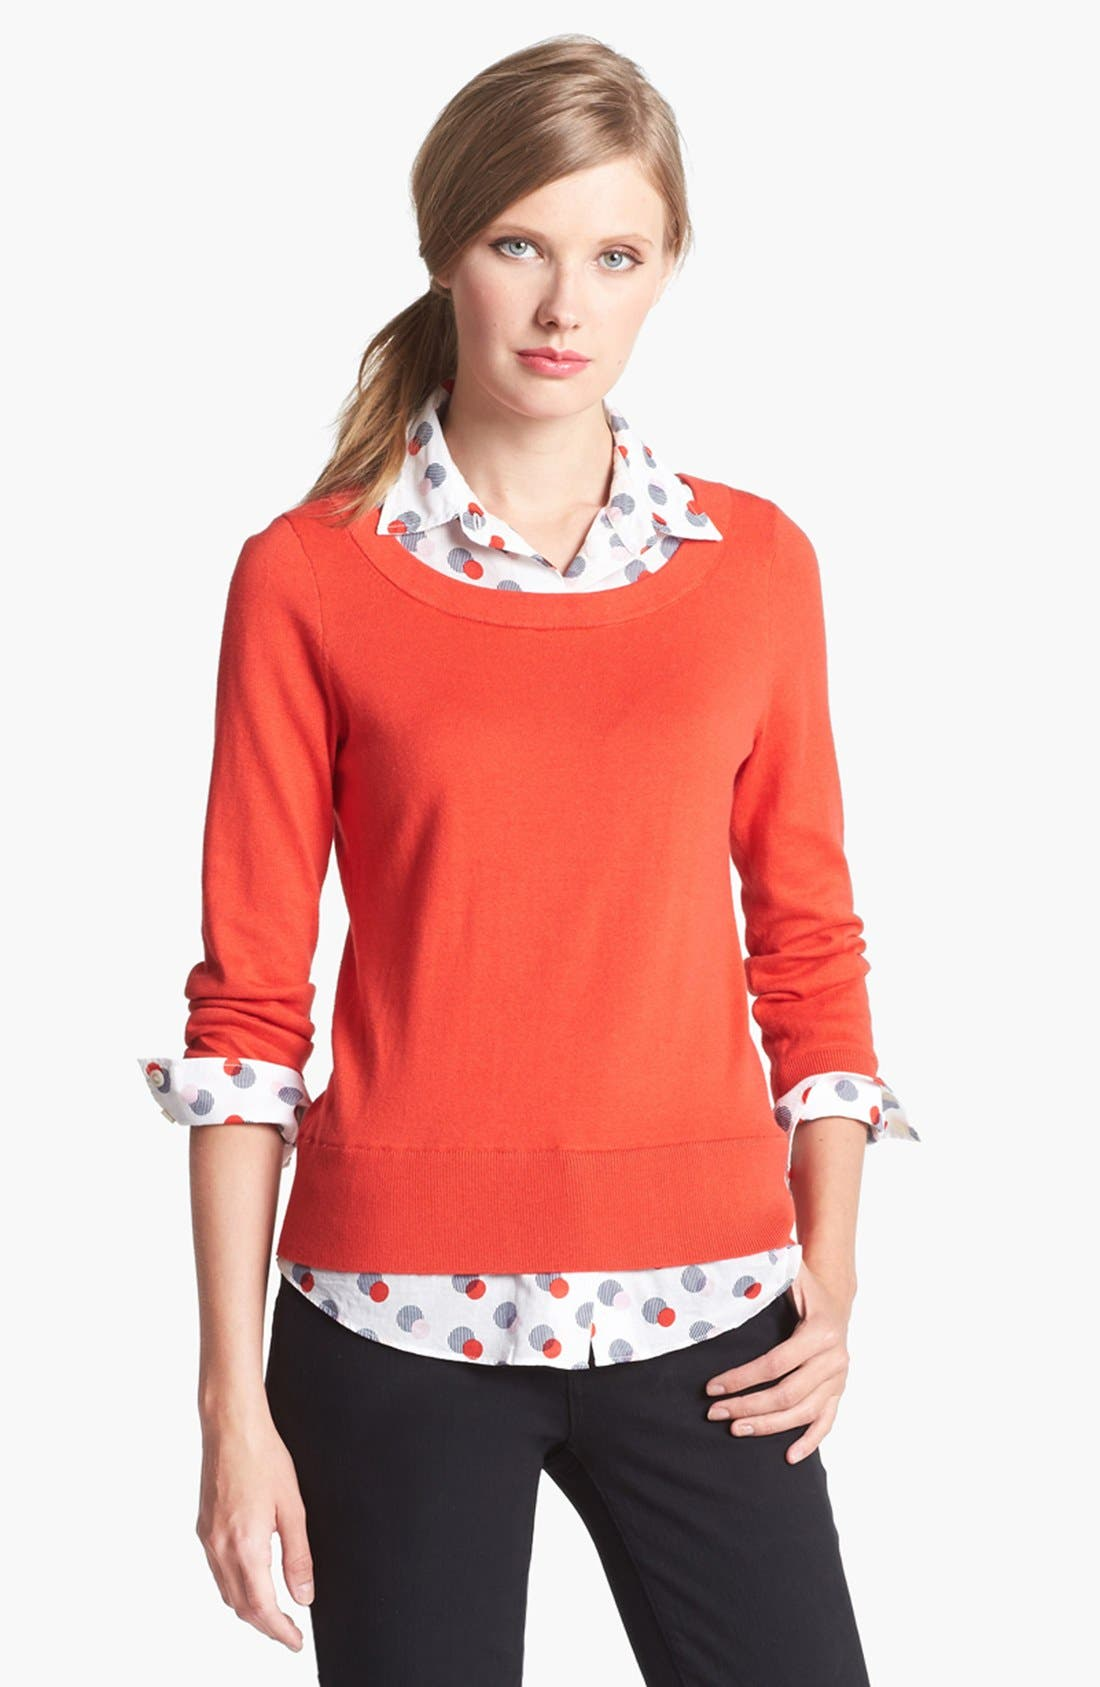 Alternate Image 1 Selected - kate spade new york 'yardley' layered sweater